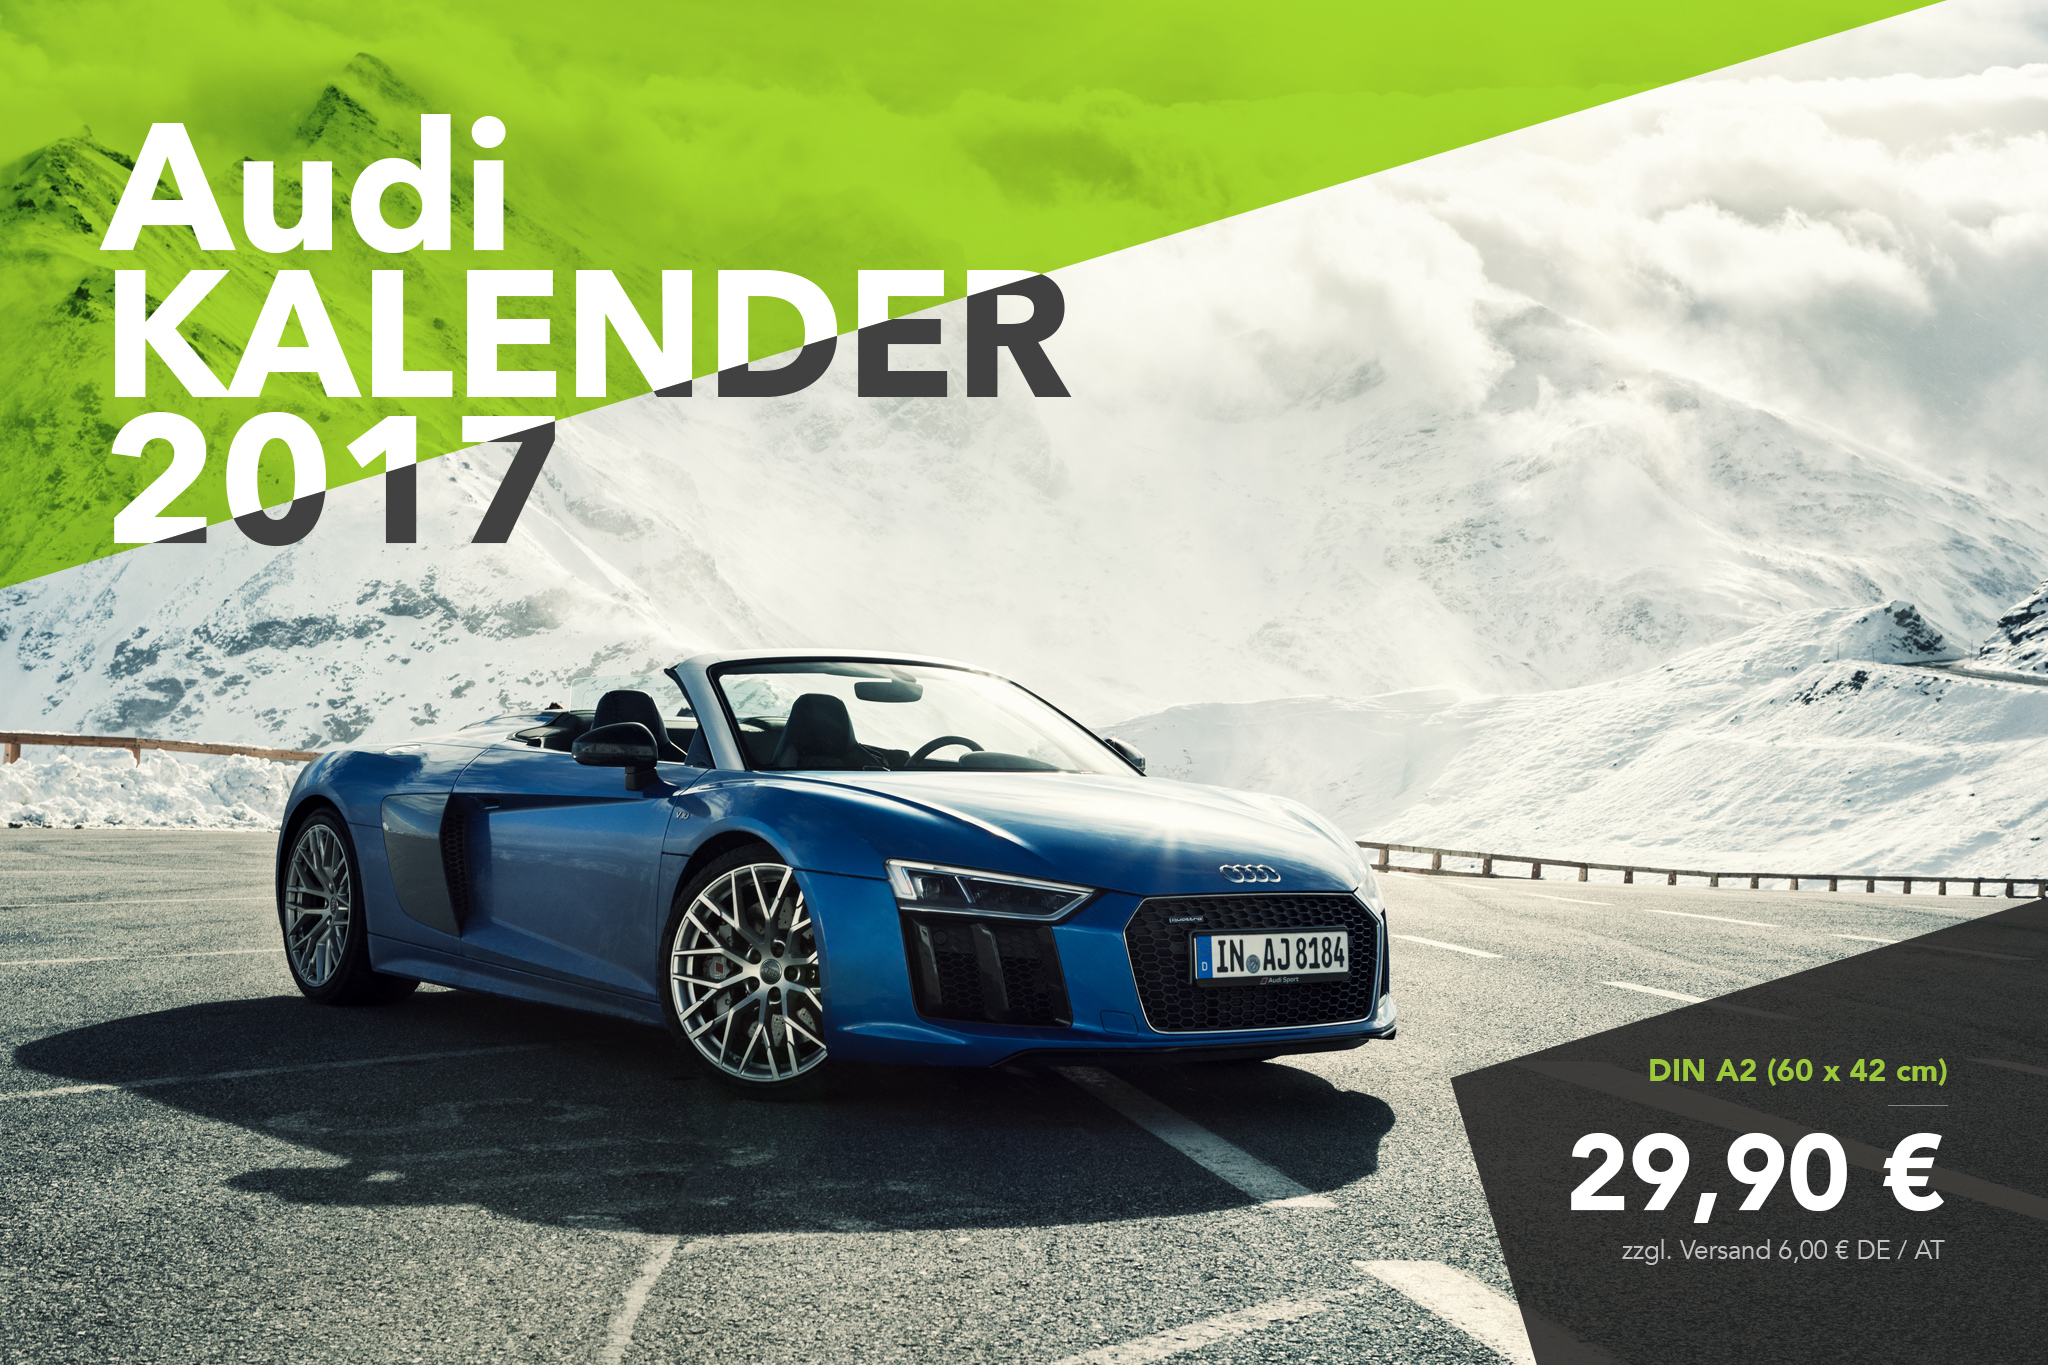 Audi Kalender 2017 - Audi R8